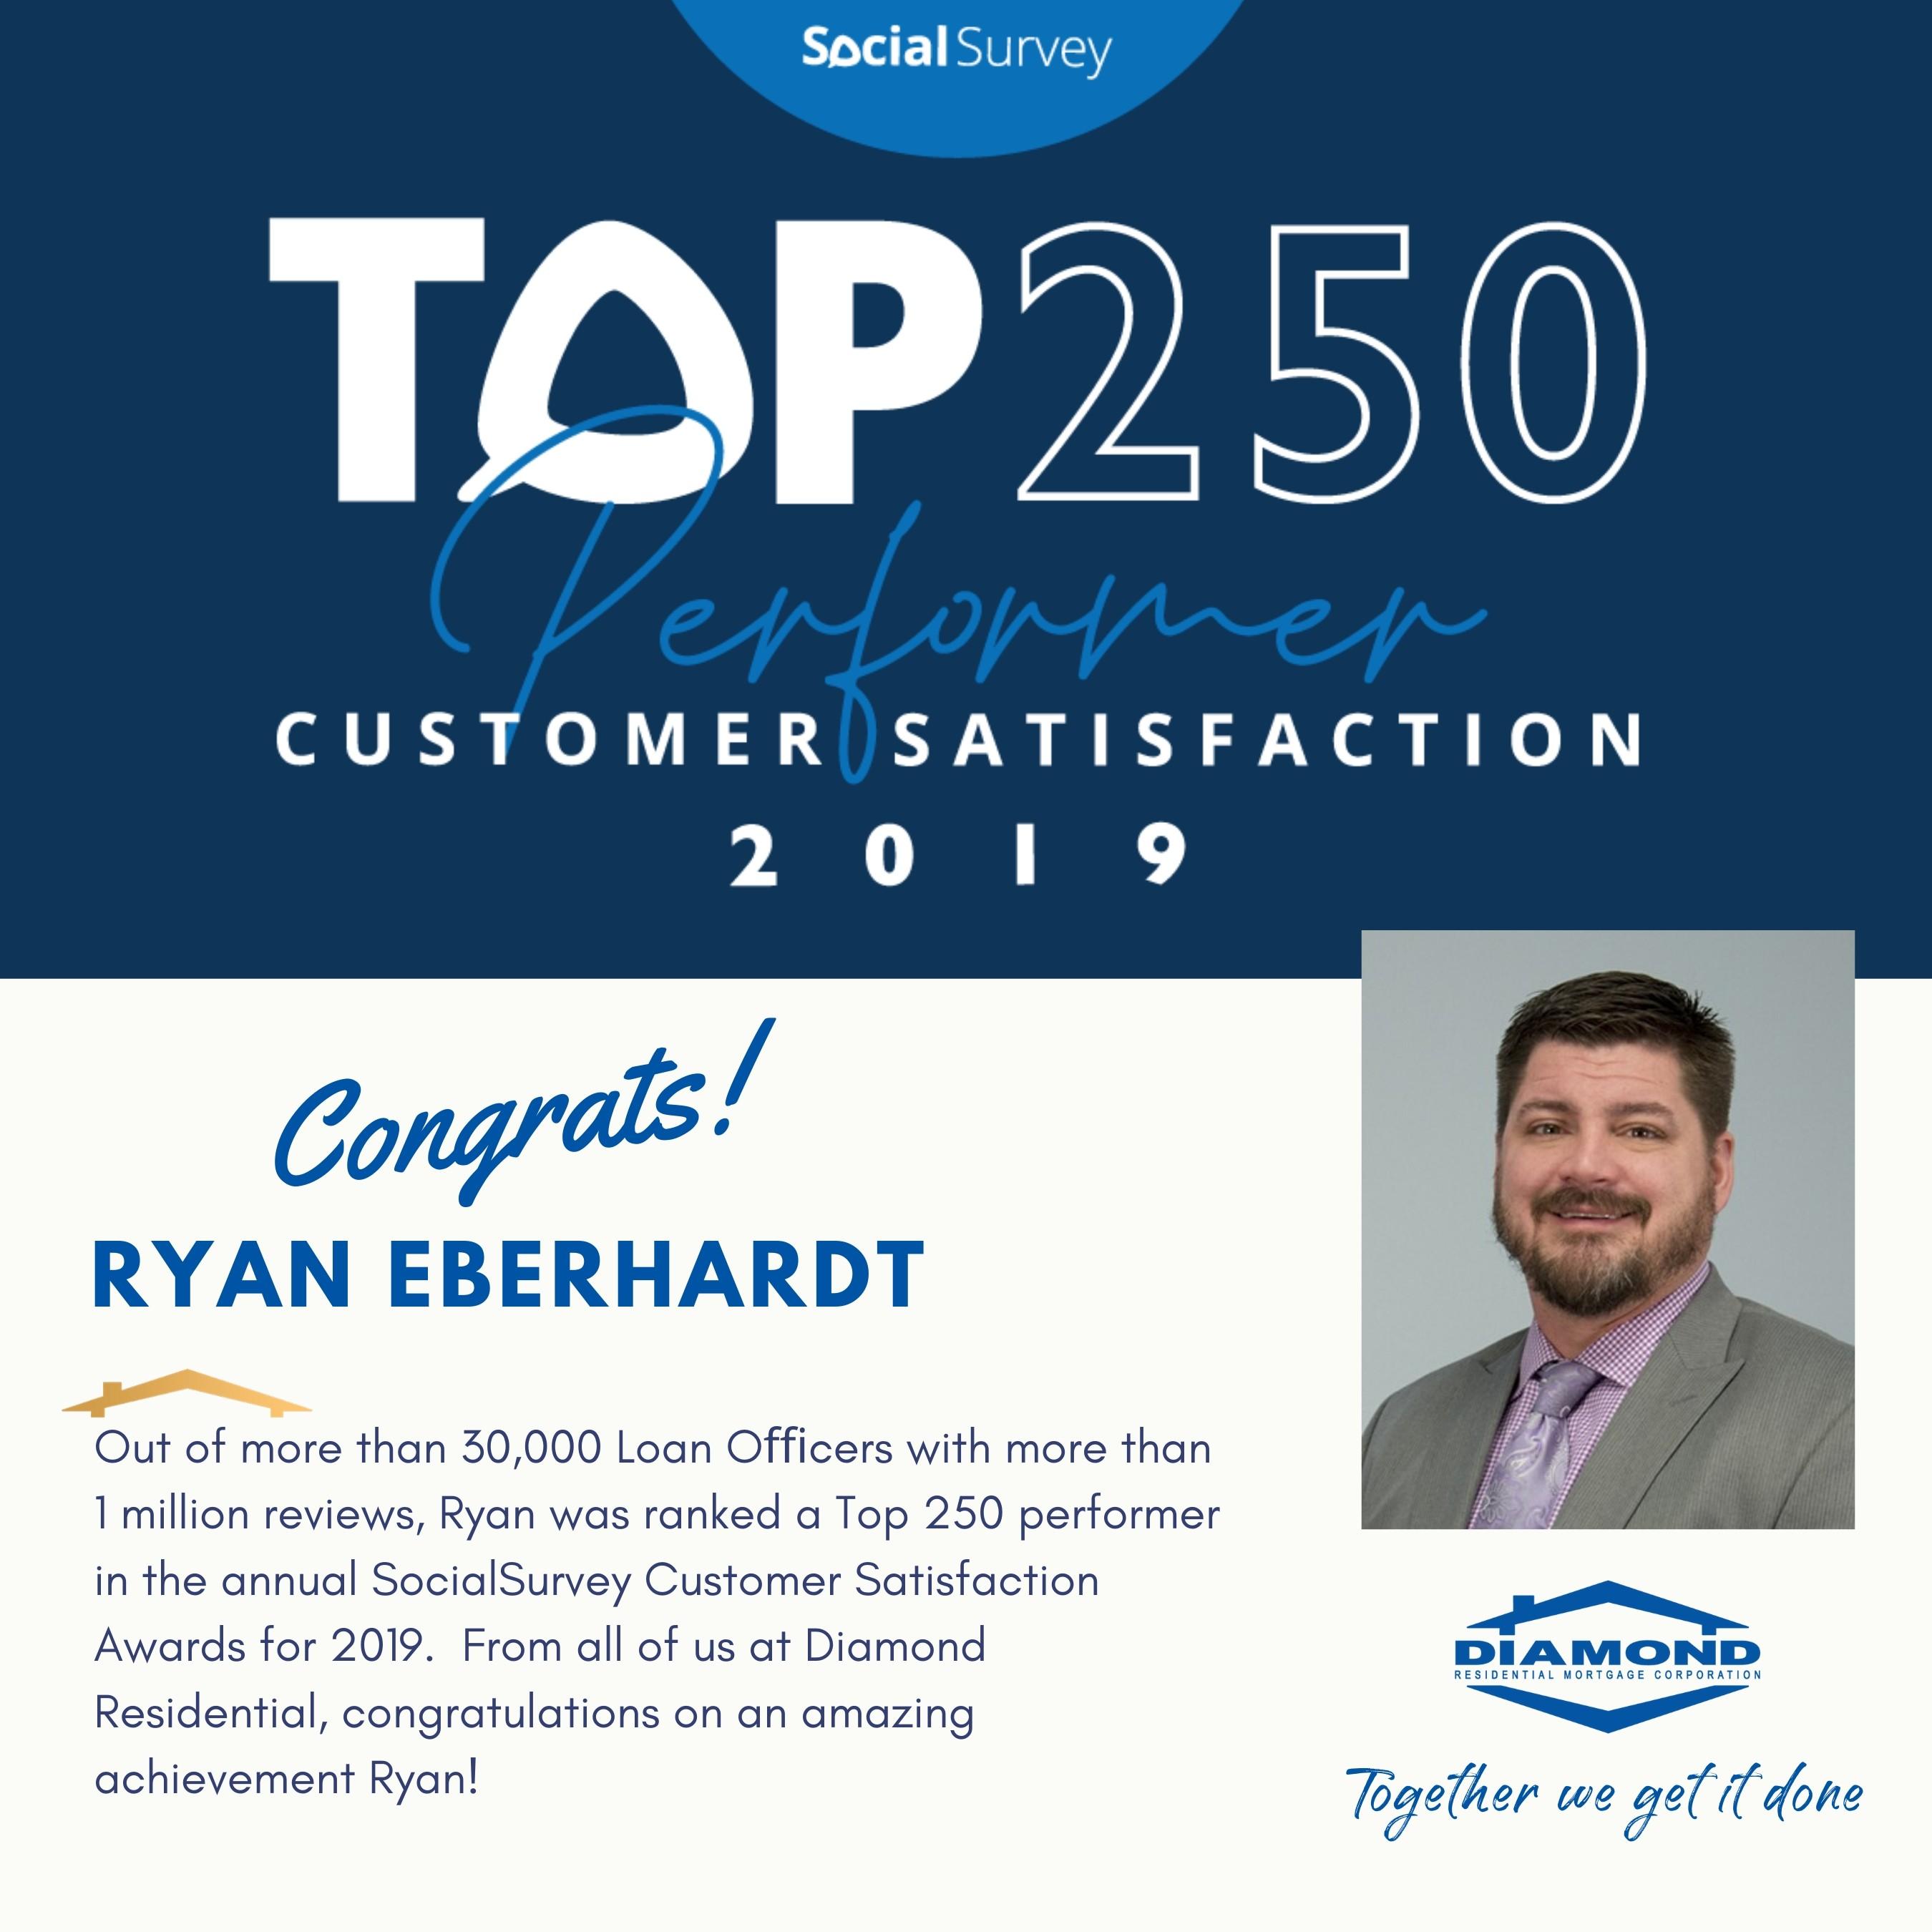 Ryan Eberhardt named Top 250 Originators in 2019 by SocialSurvey